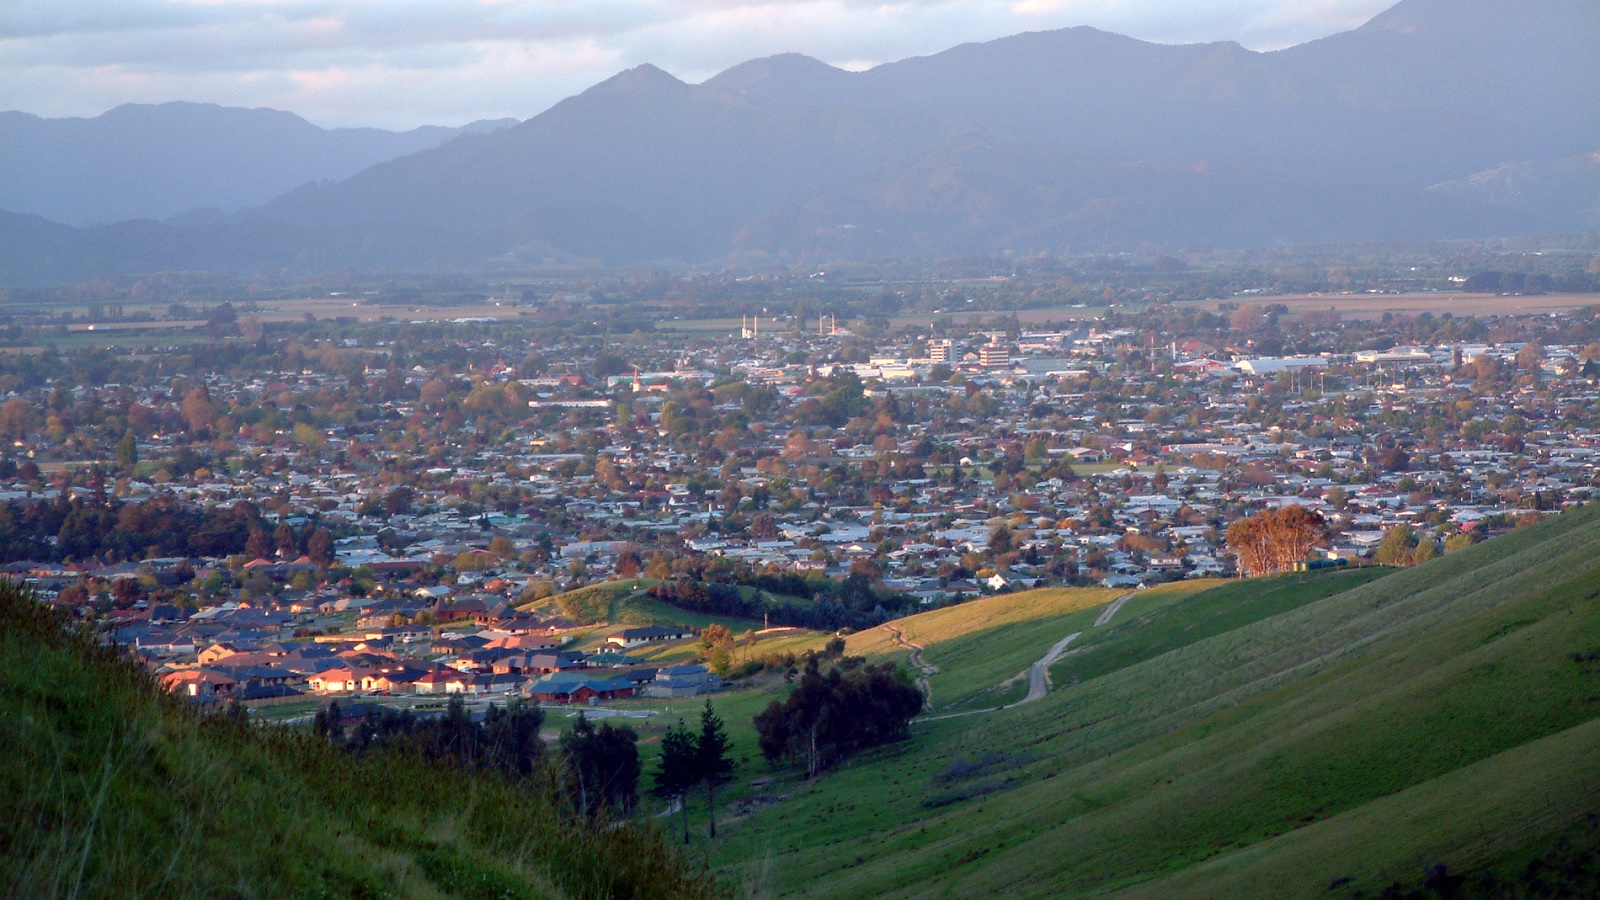 Locations of interest announced in Rotorua, Blenheim, Wellington